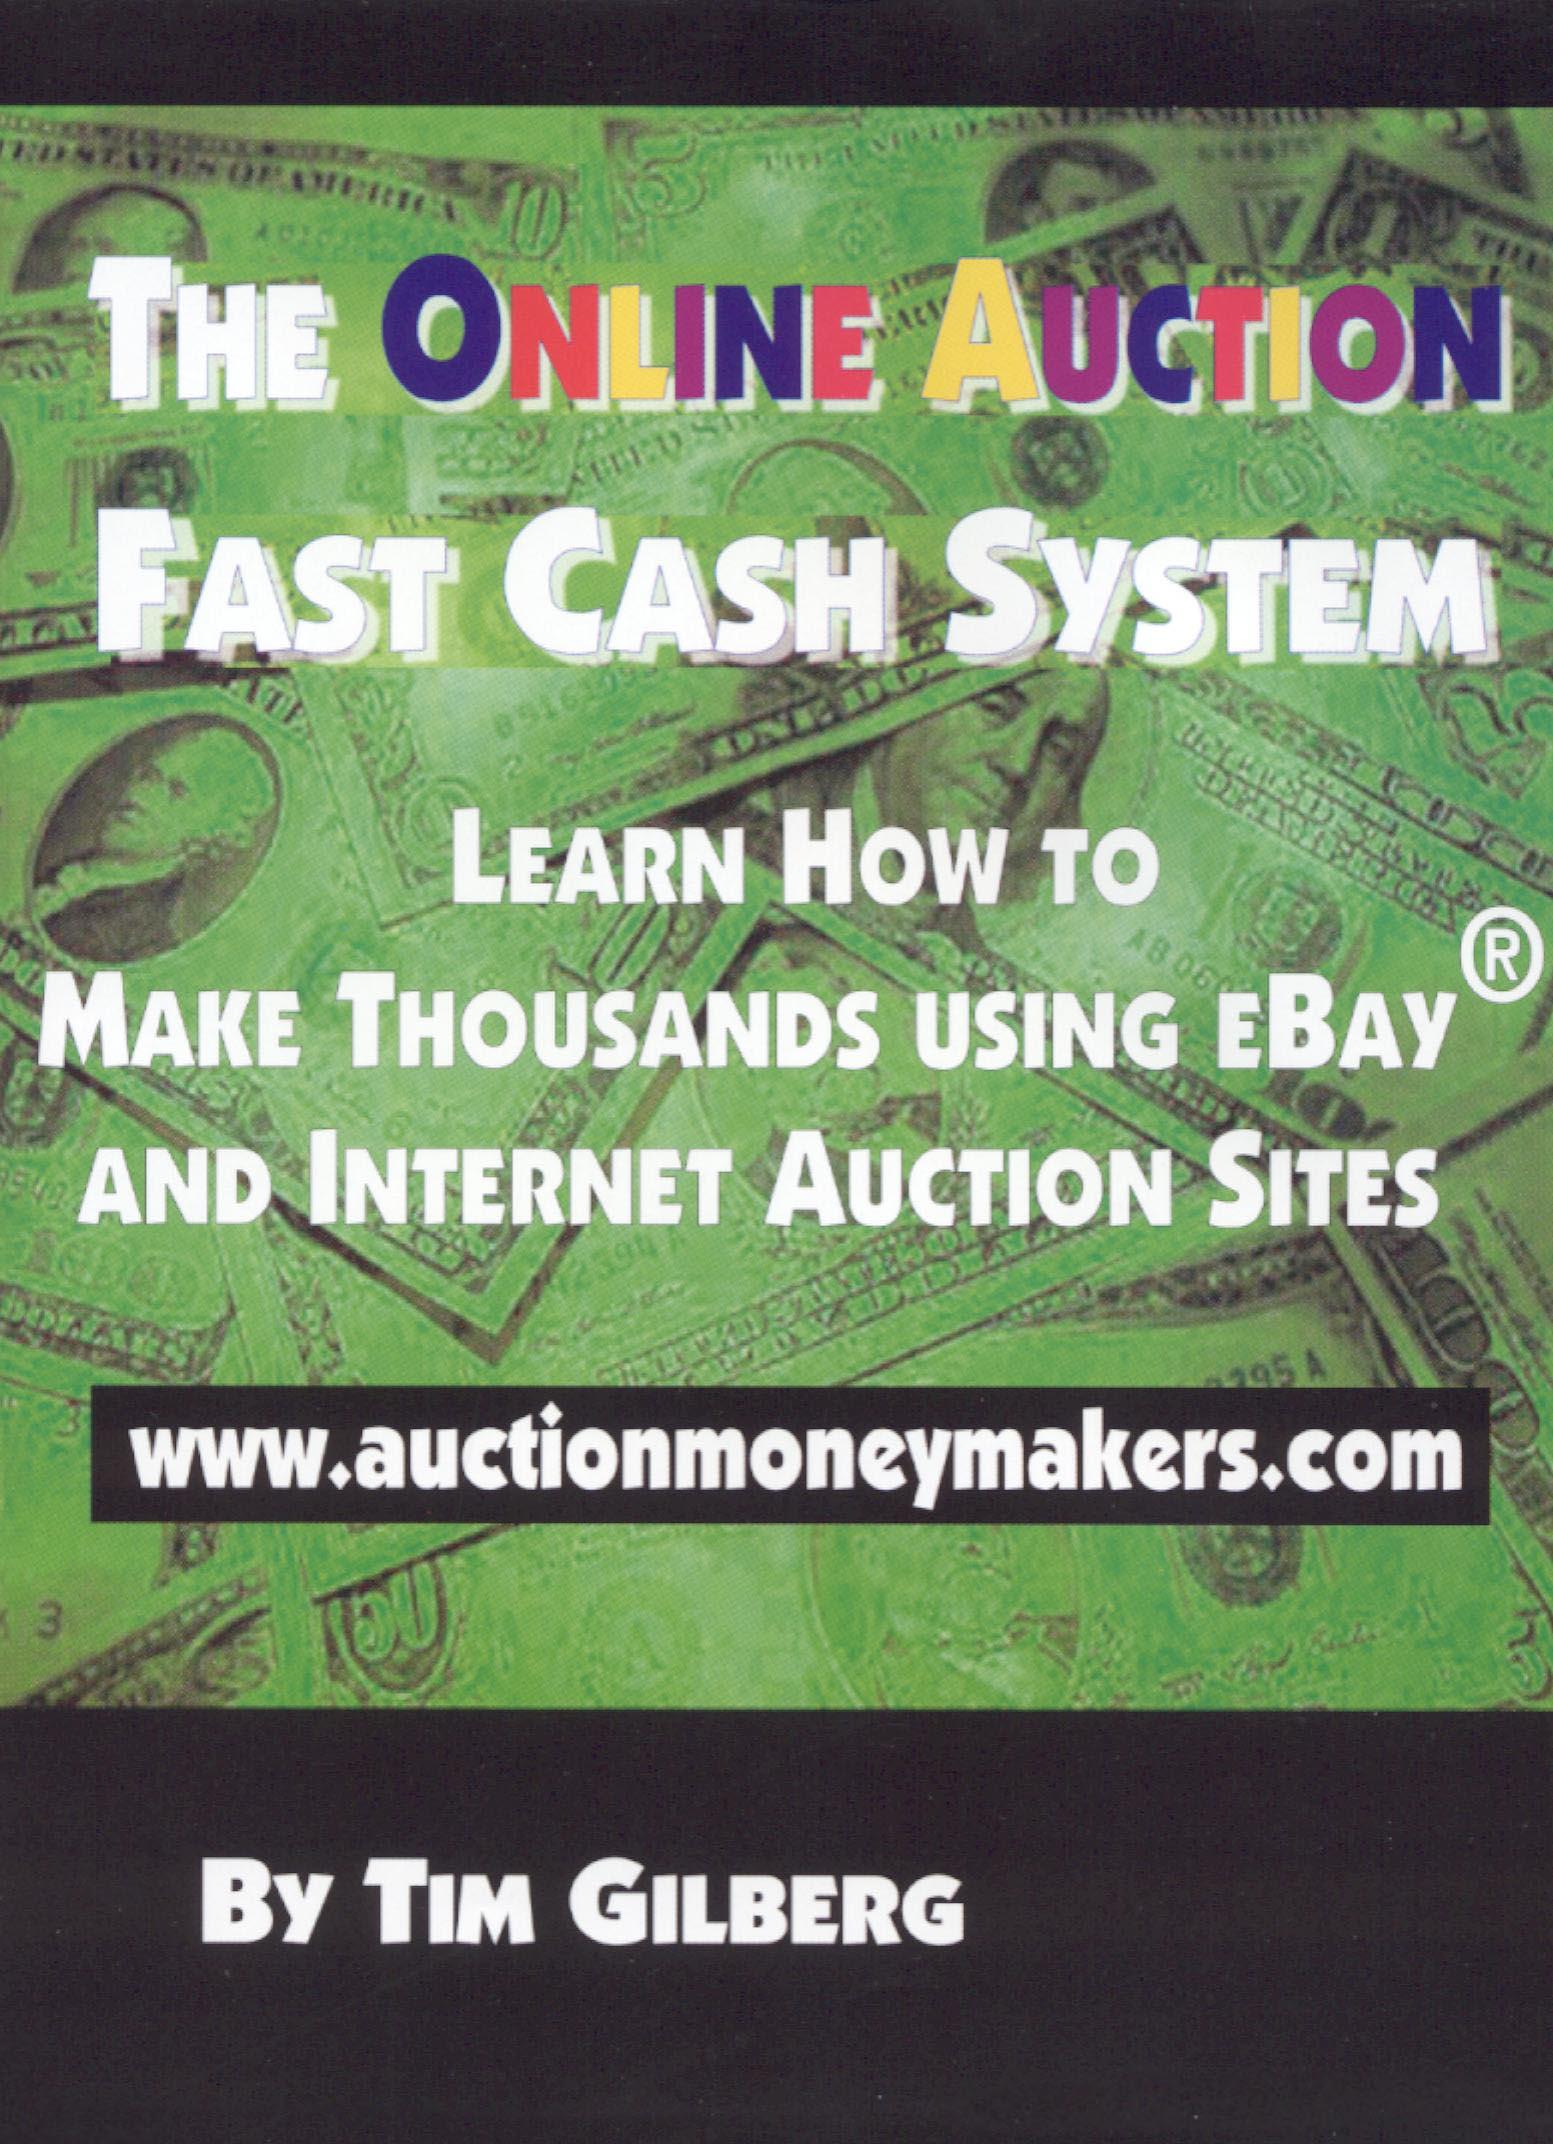 The Online Auction Fast Cash System